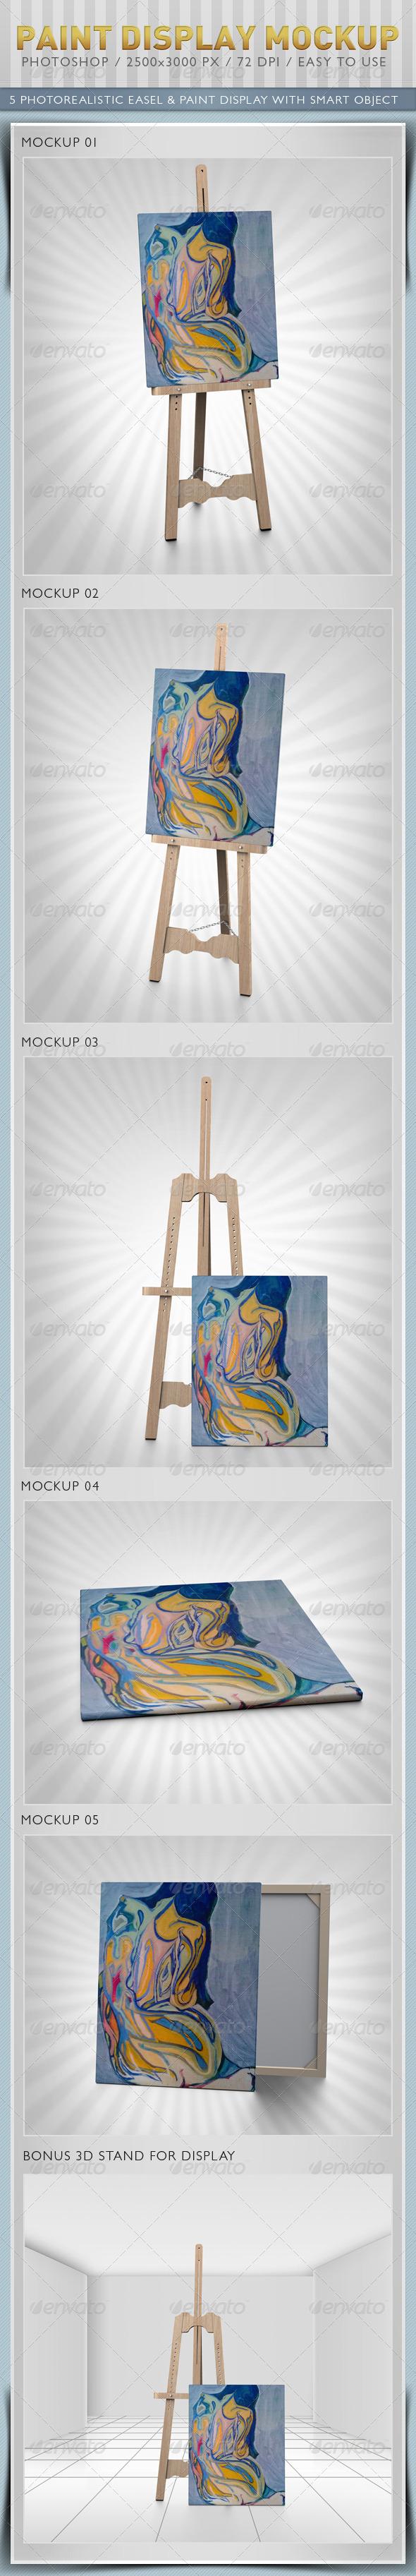 Paint Display Mockup - Miscellaneous Displays